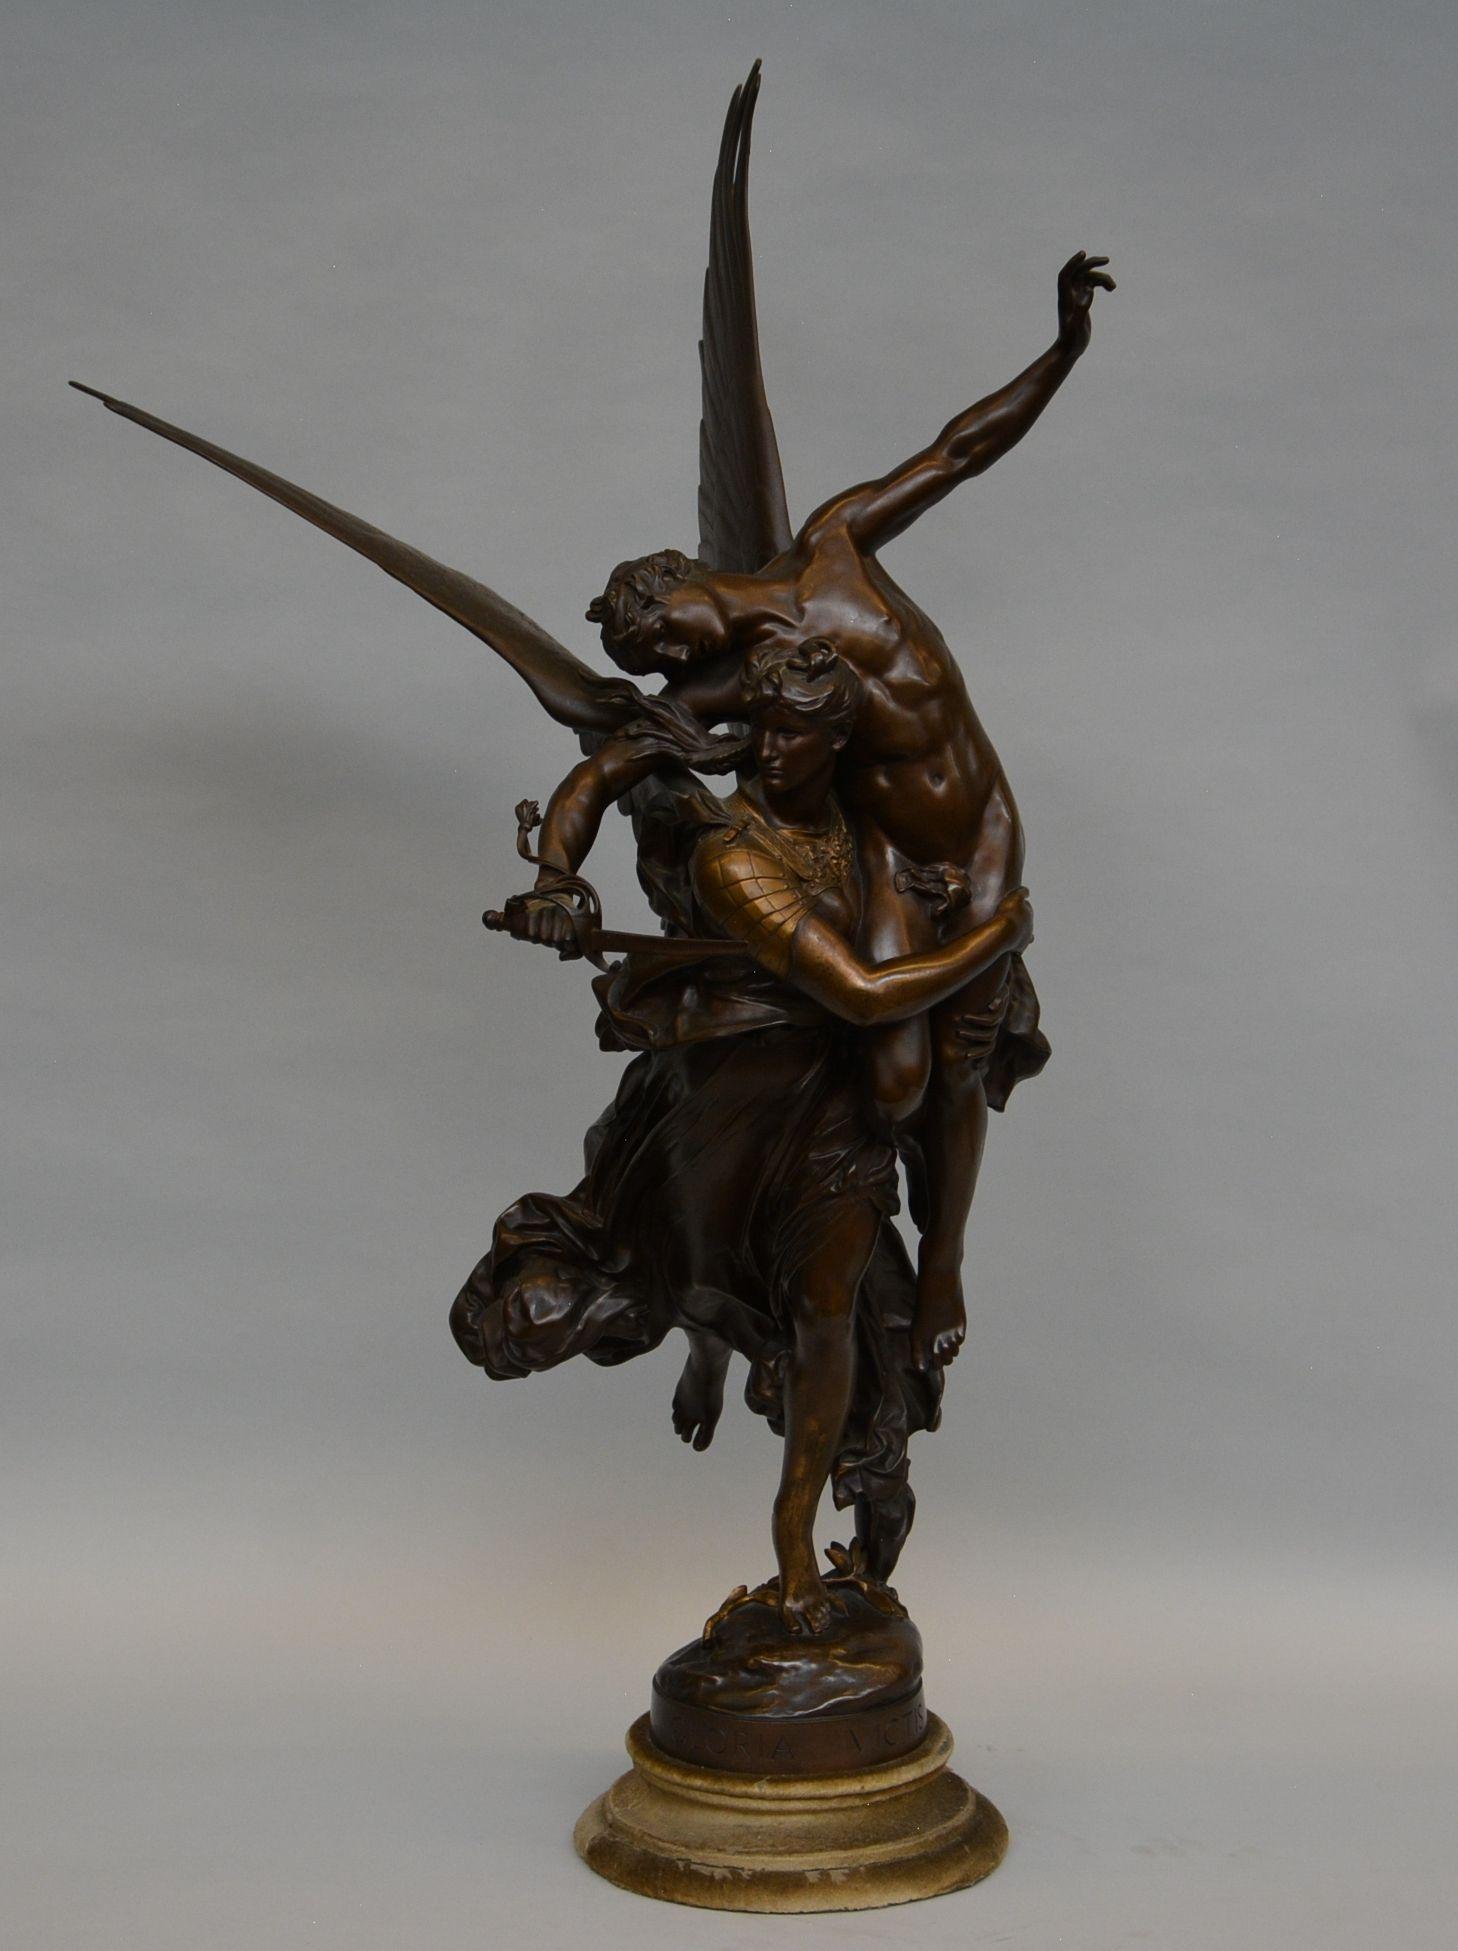 An impressive bronze figural sculpture, Gloria Victis